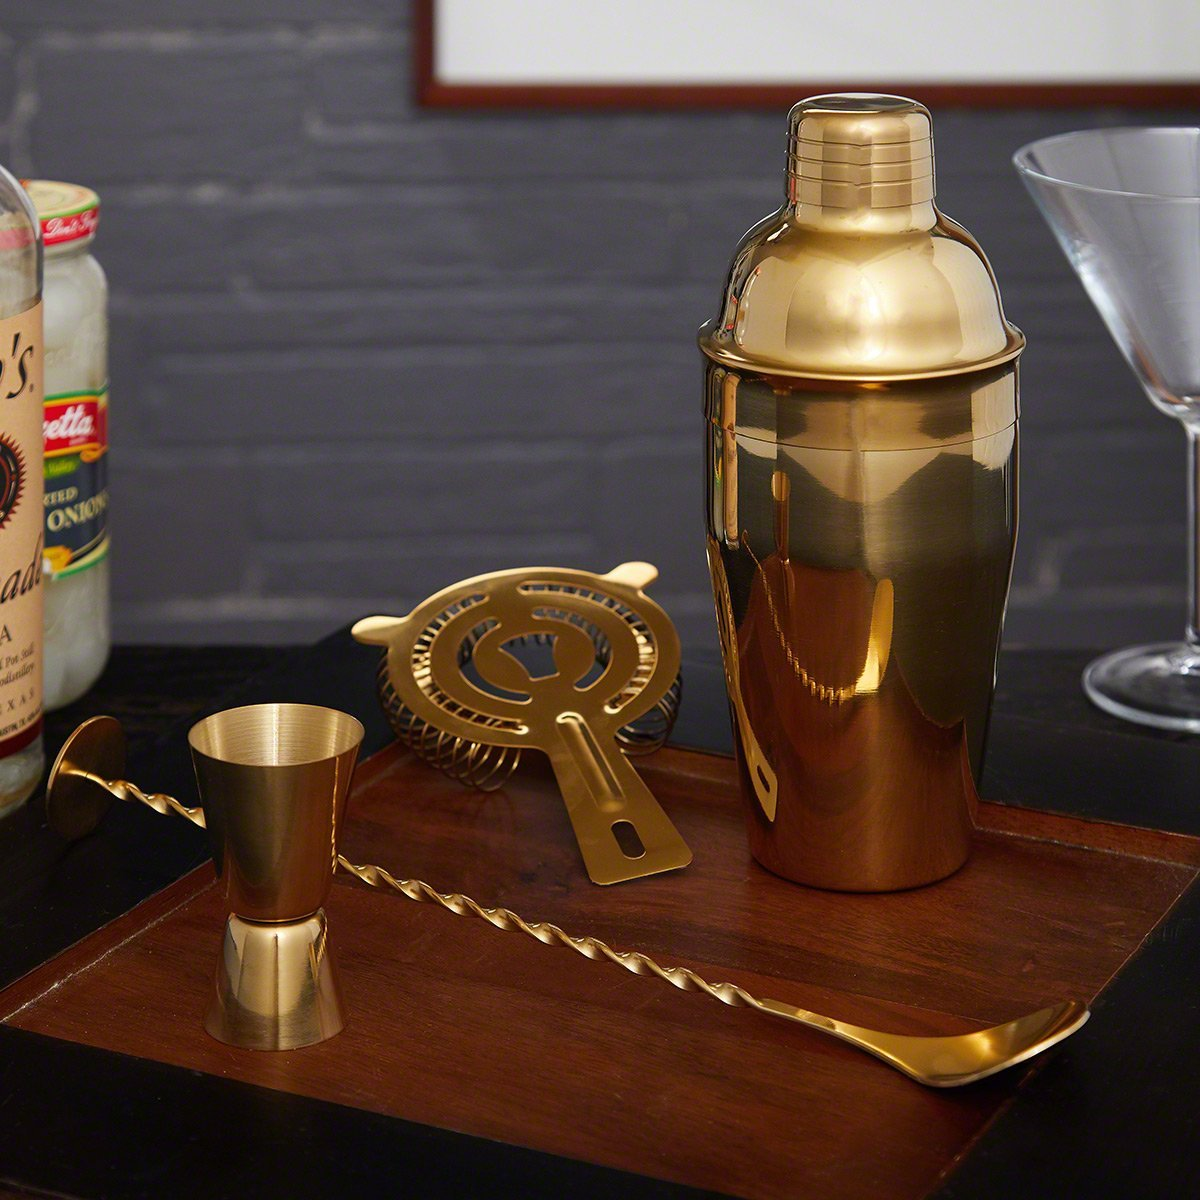 Ridgemont Gold Bar Tool Set and Cocktail Shaker